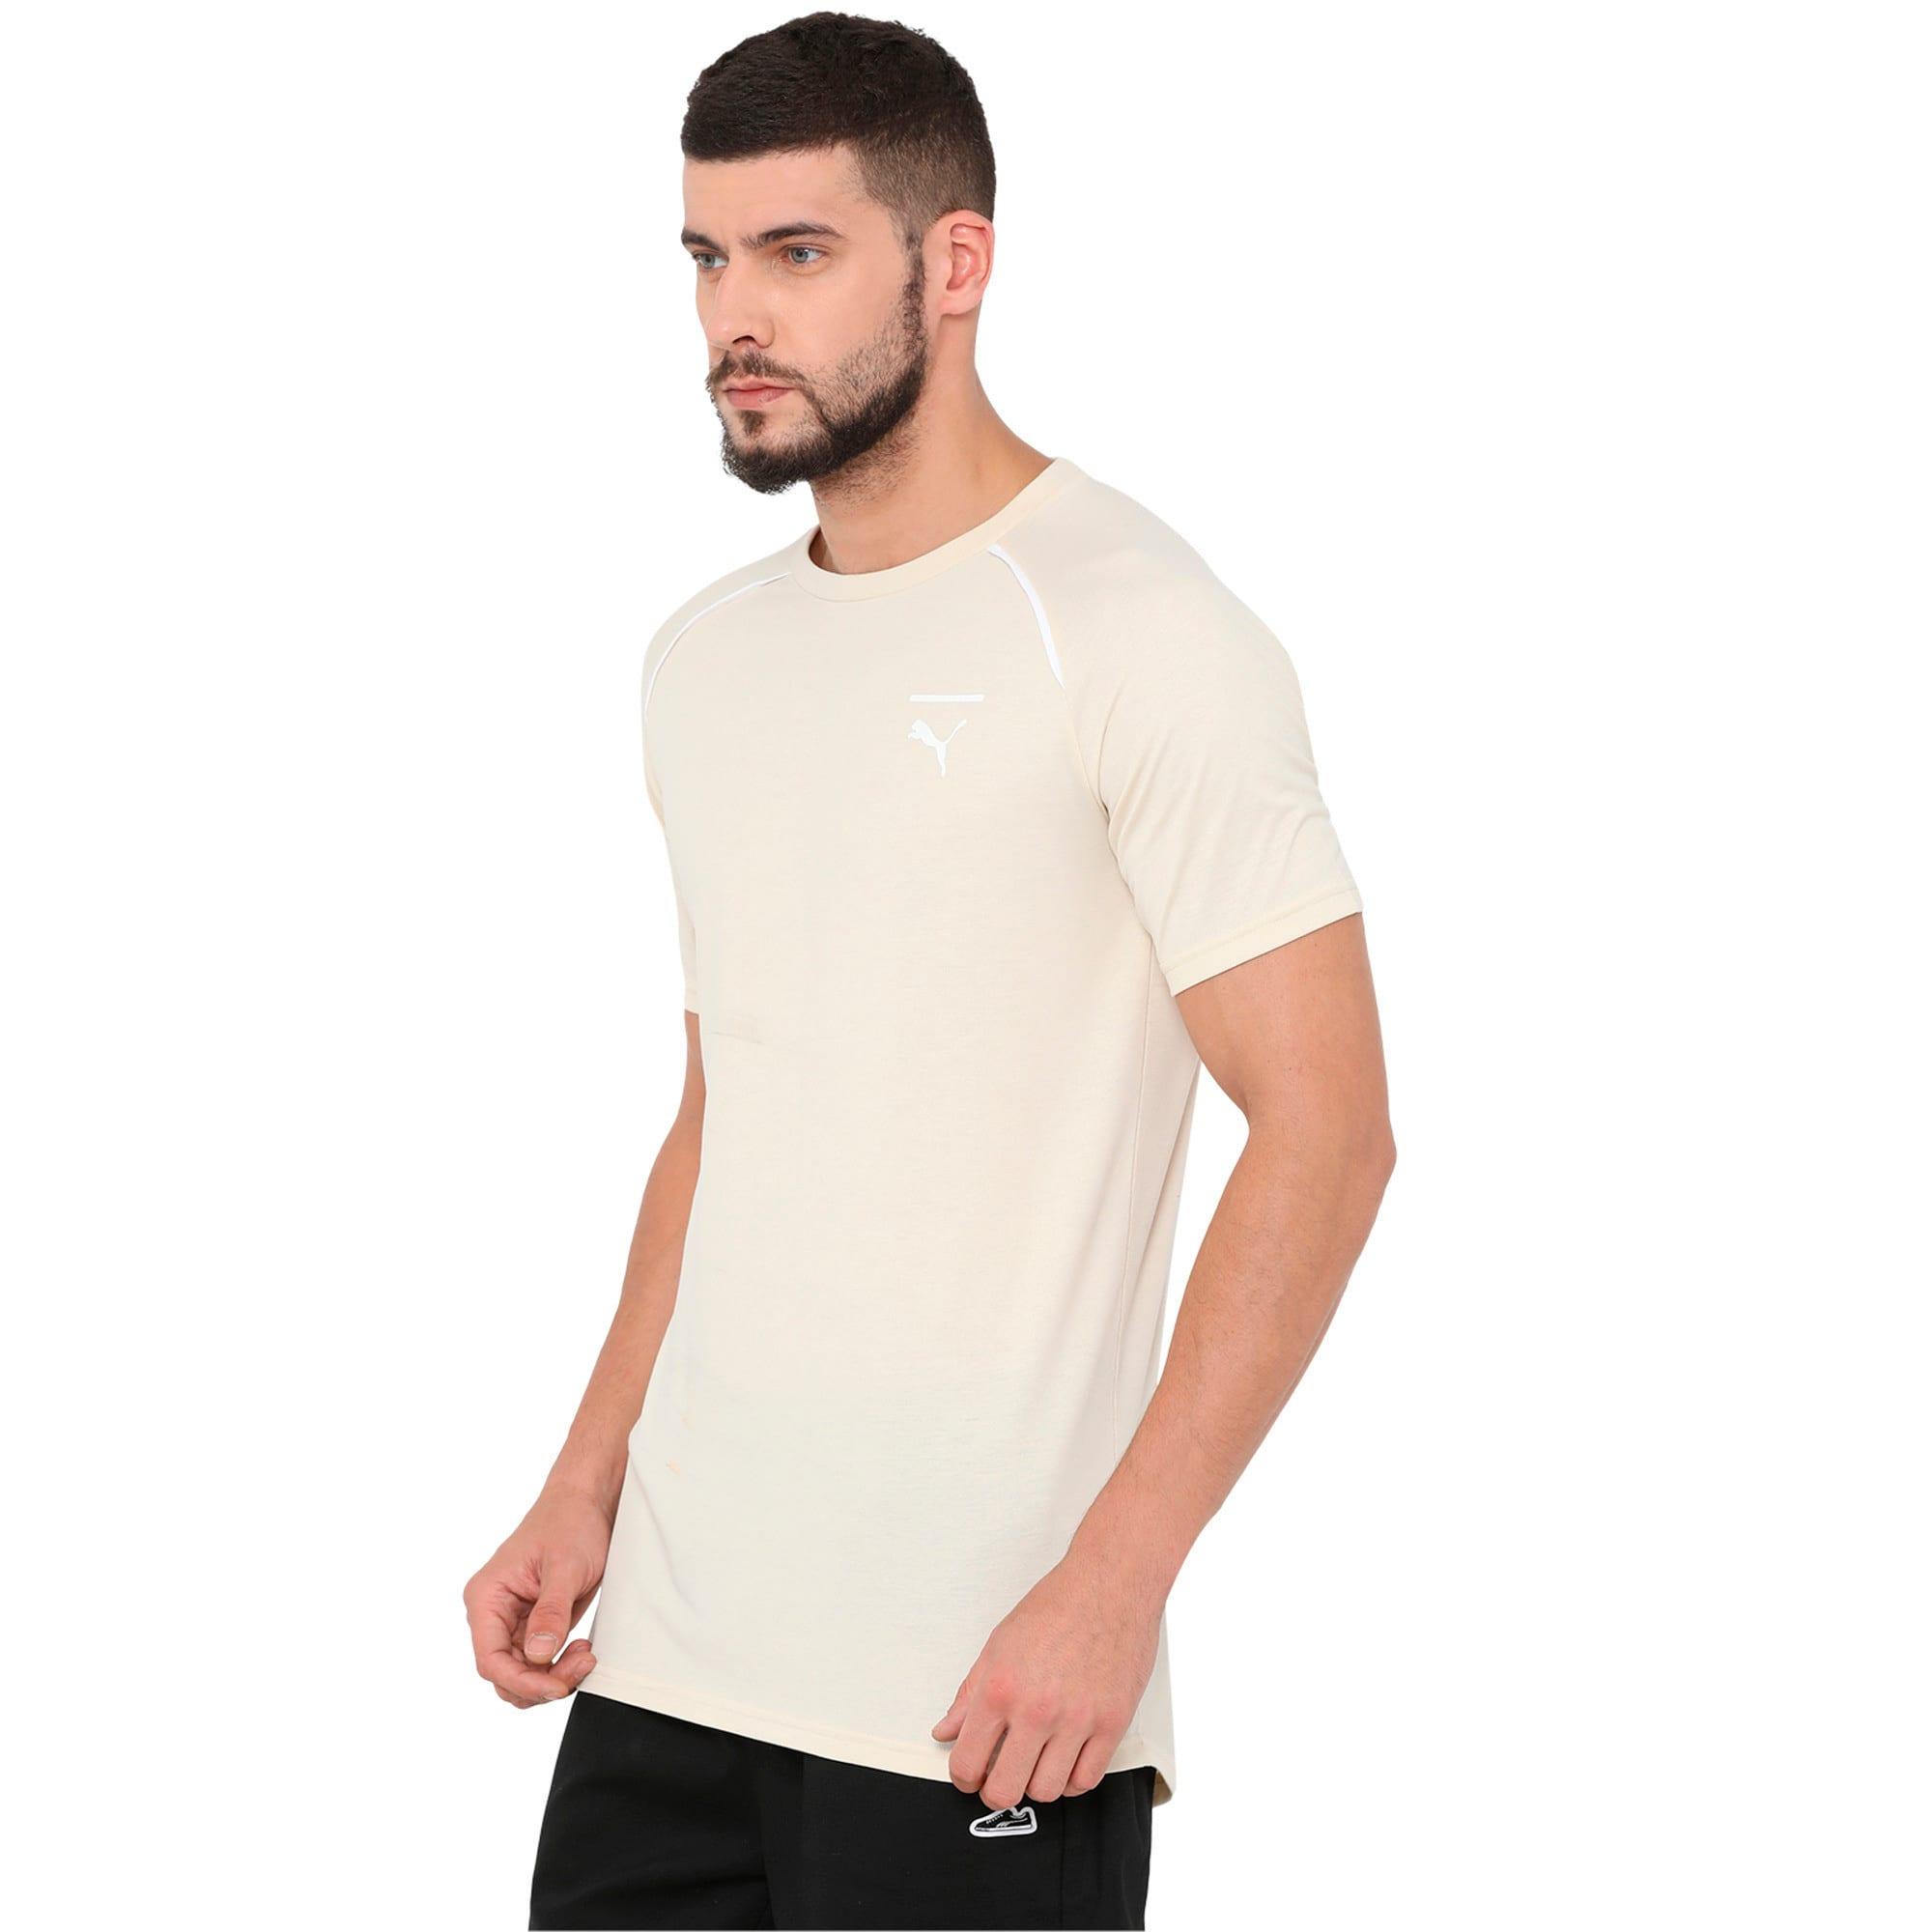 Thumbnail 2 of Evolution Men's Core T-Shirt, Birch, medium-IND